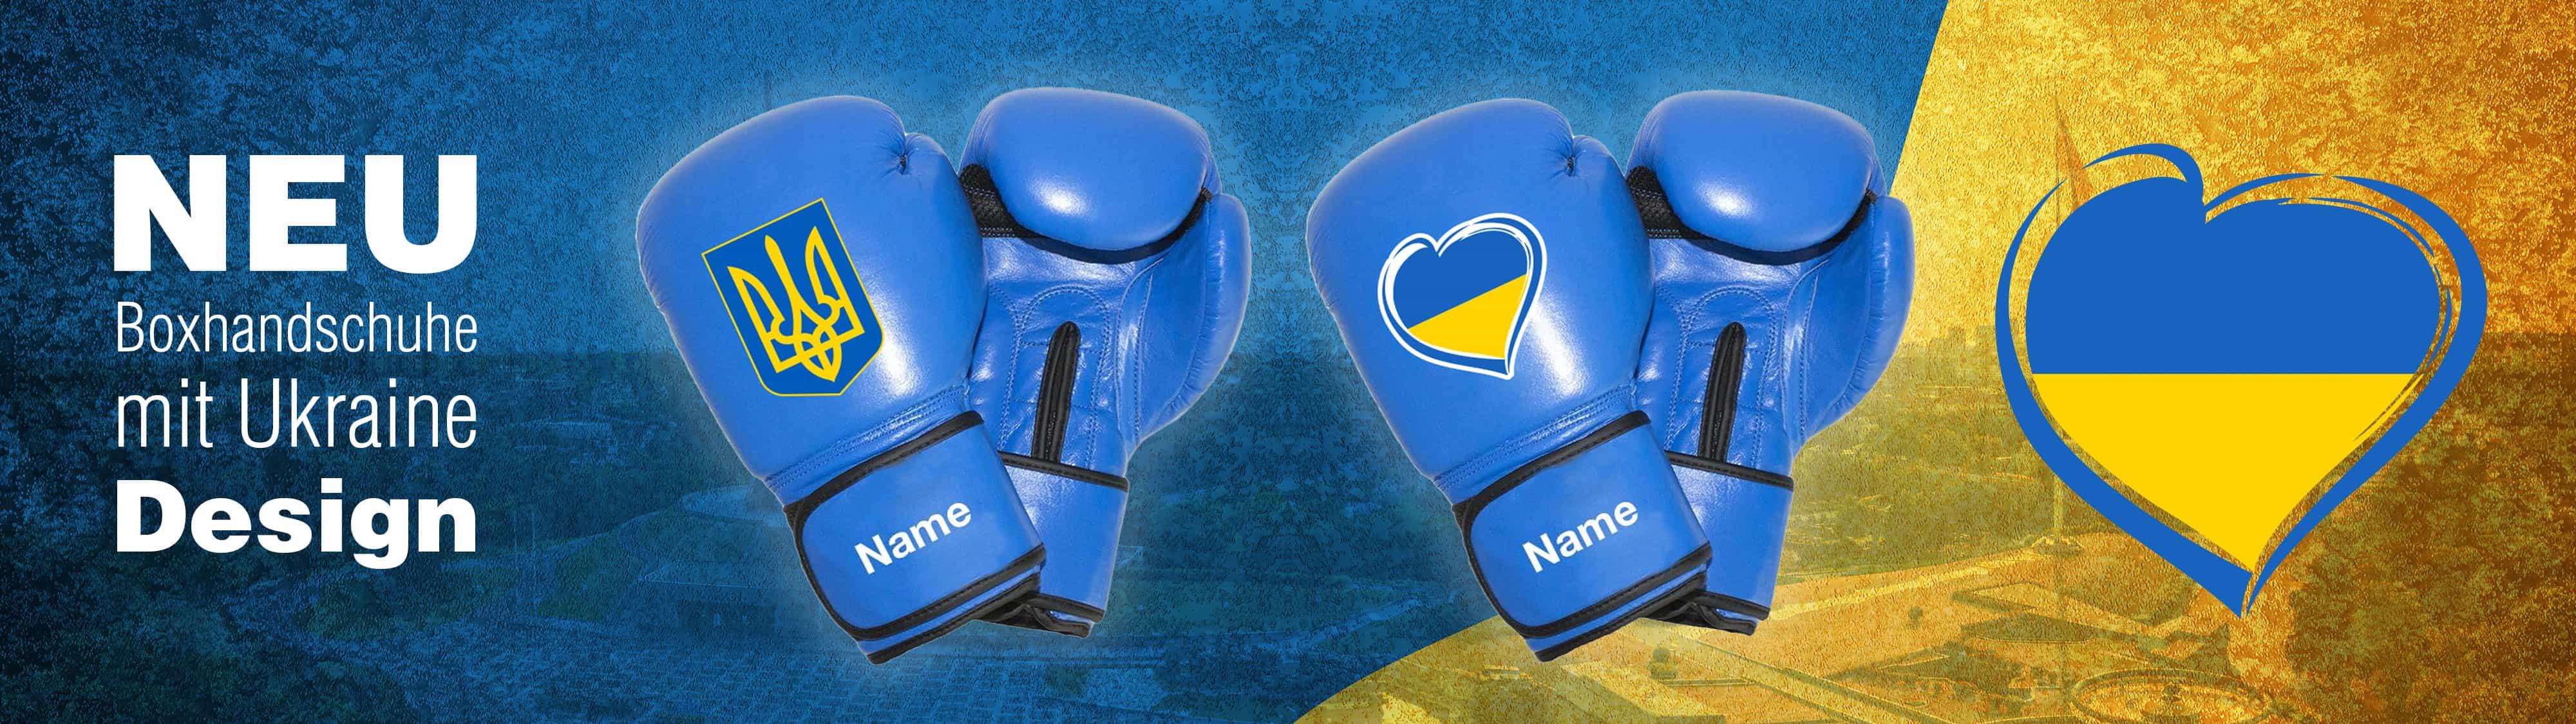 Boxhandschuhe personalisiert mit dem eigenem Namen selber